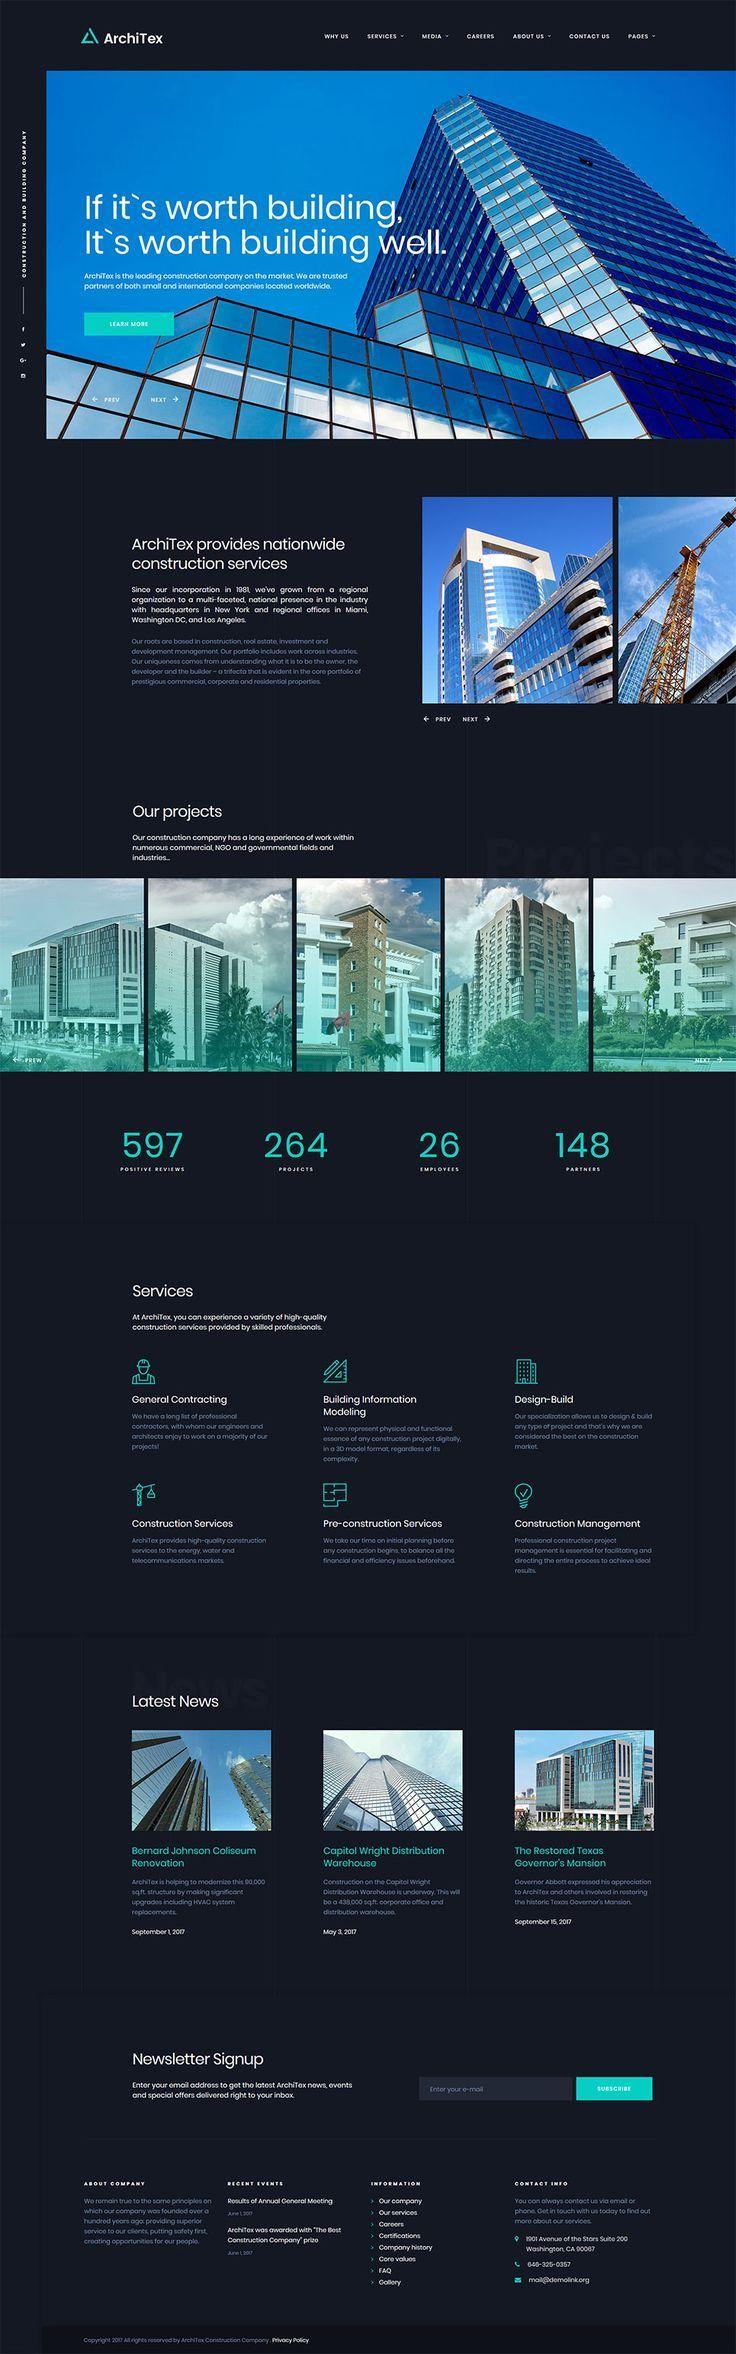 366 best Web Templates images on Pinterest | Design web, Editorial ...